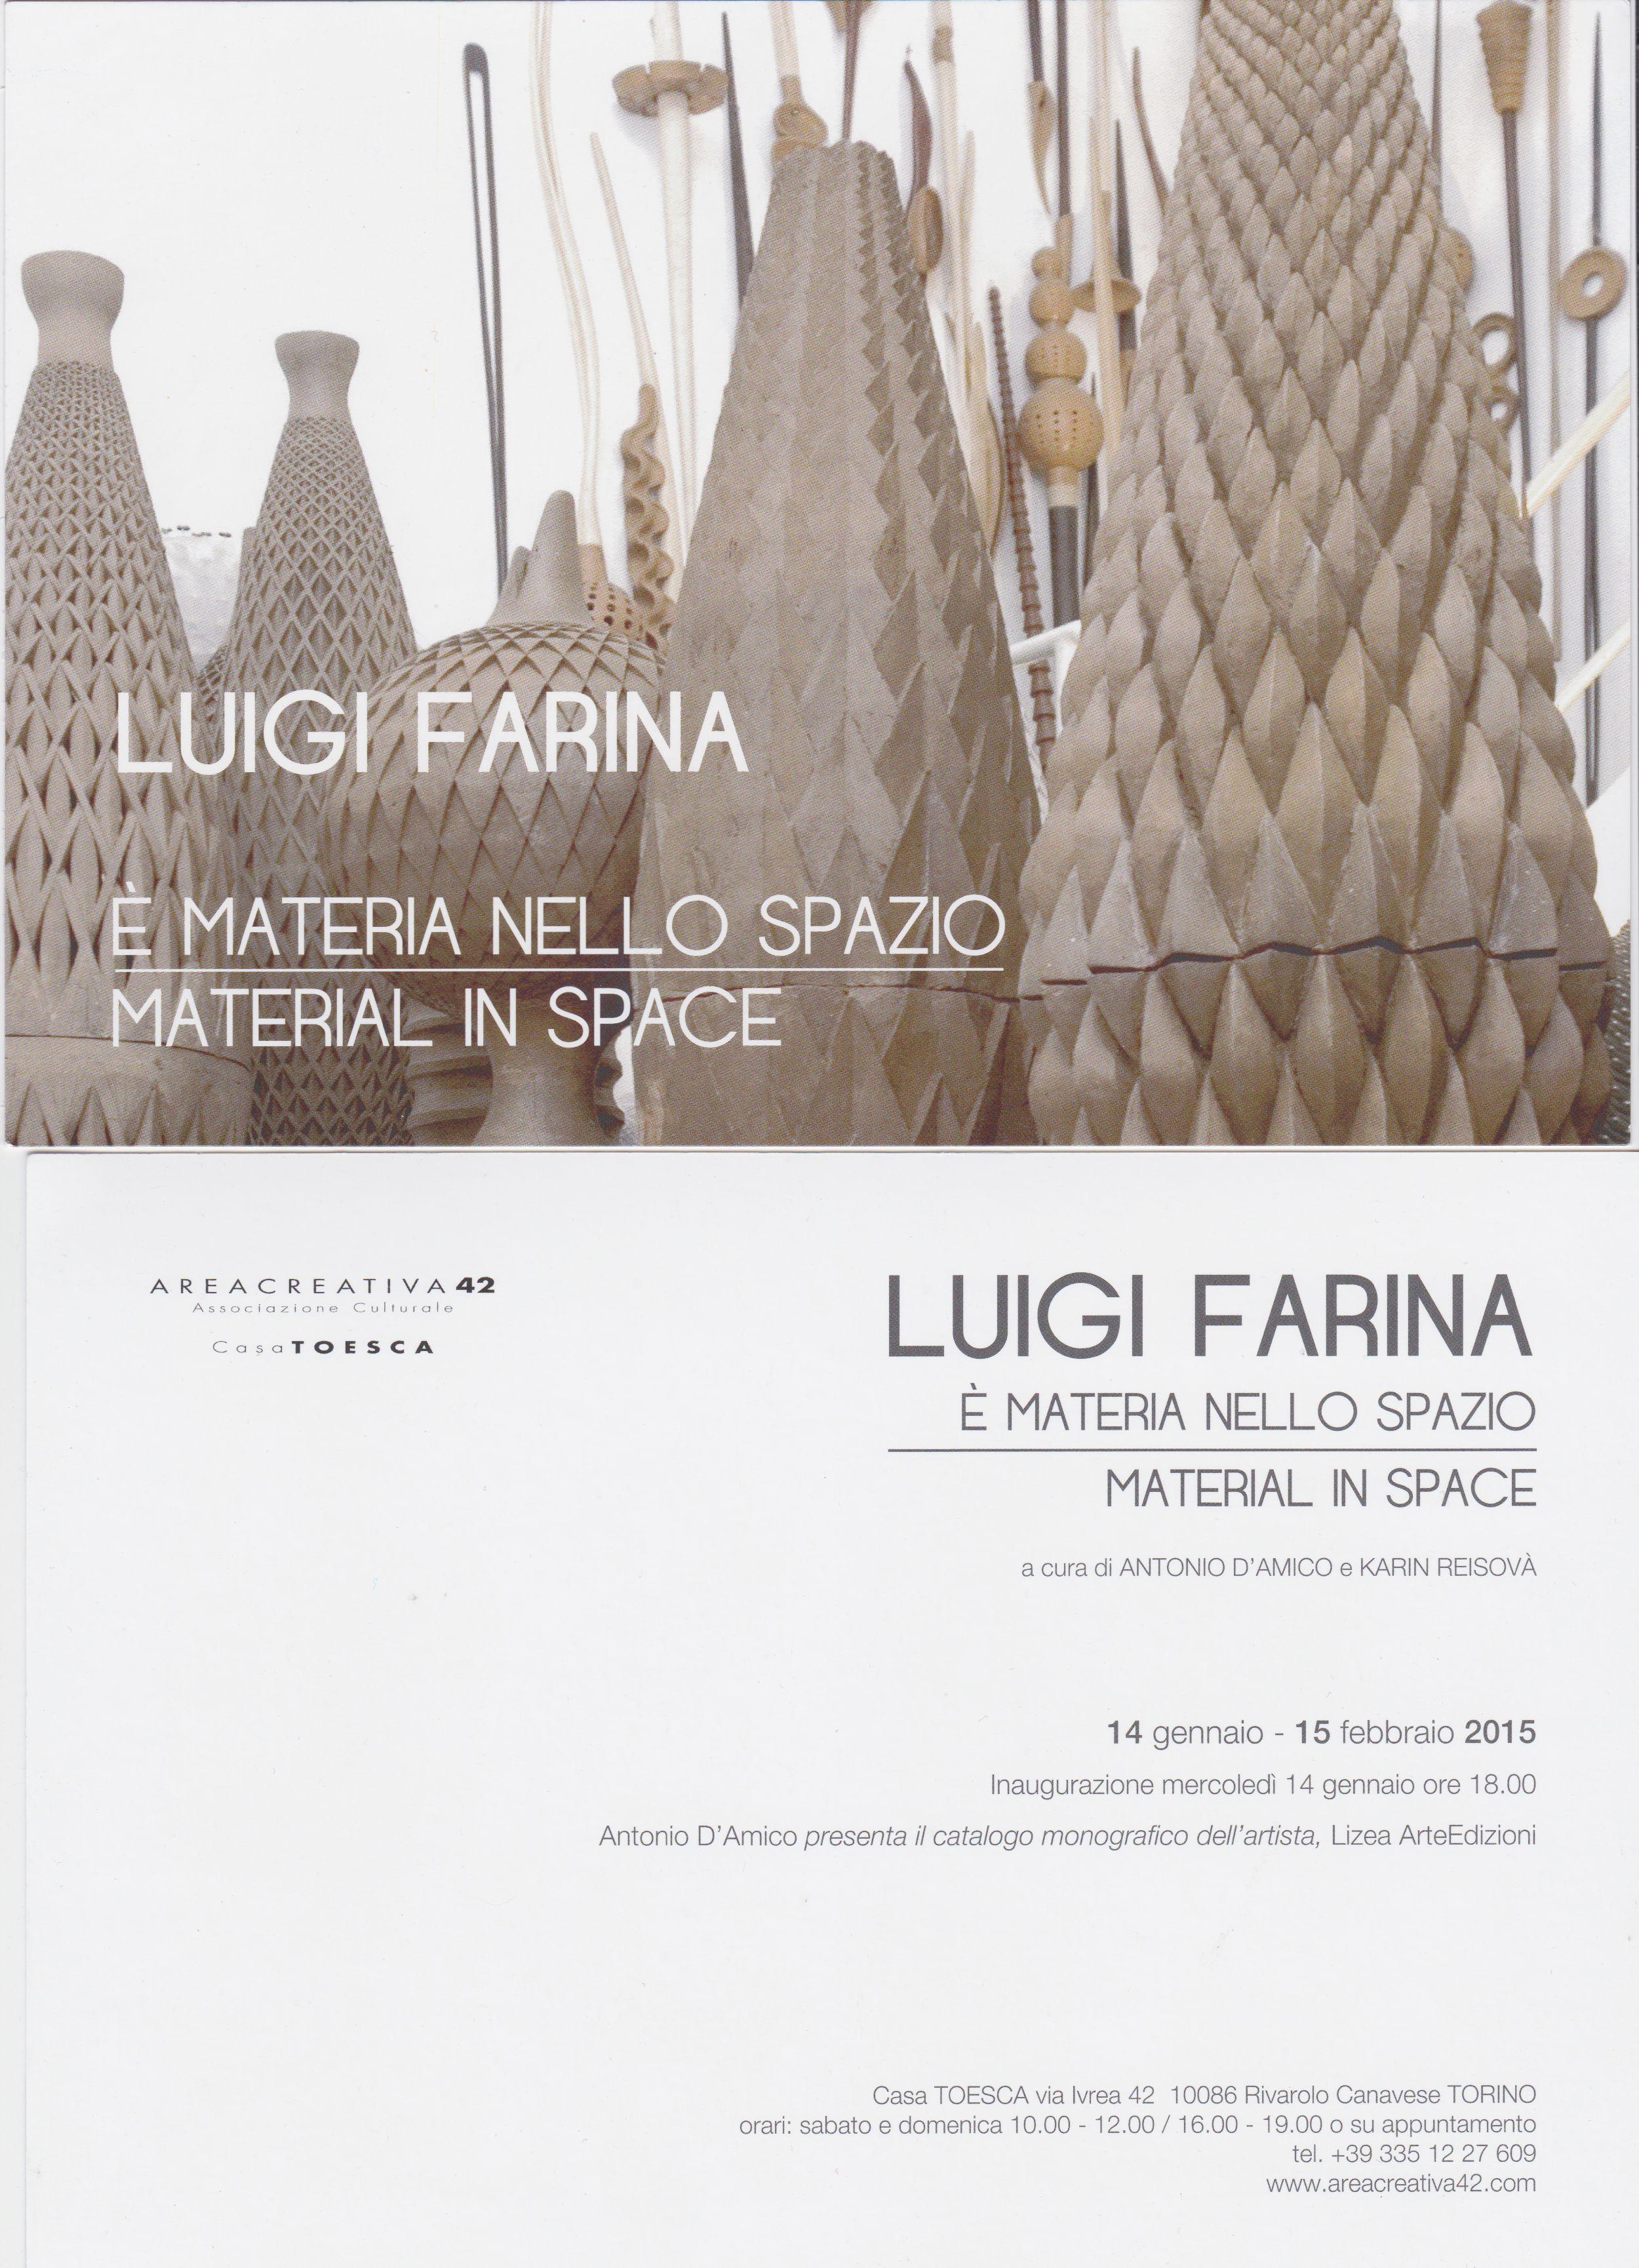 Luigi Farina - Material in space